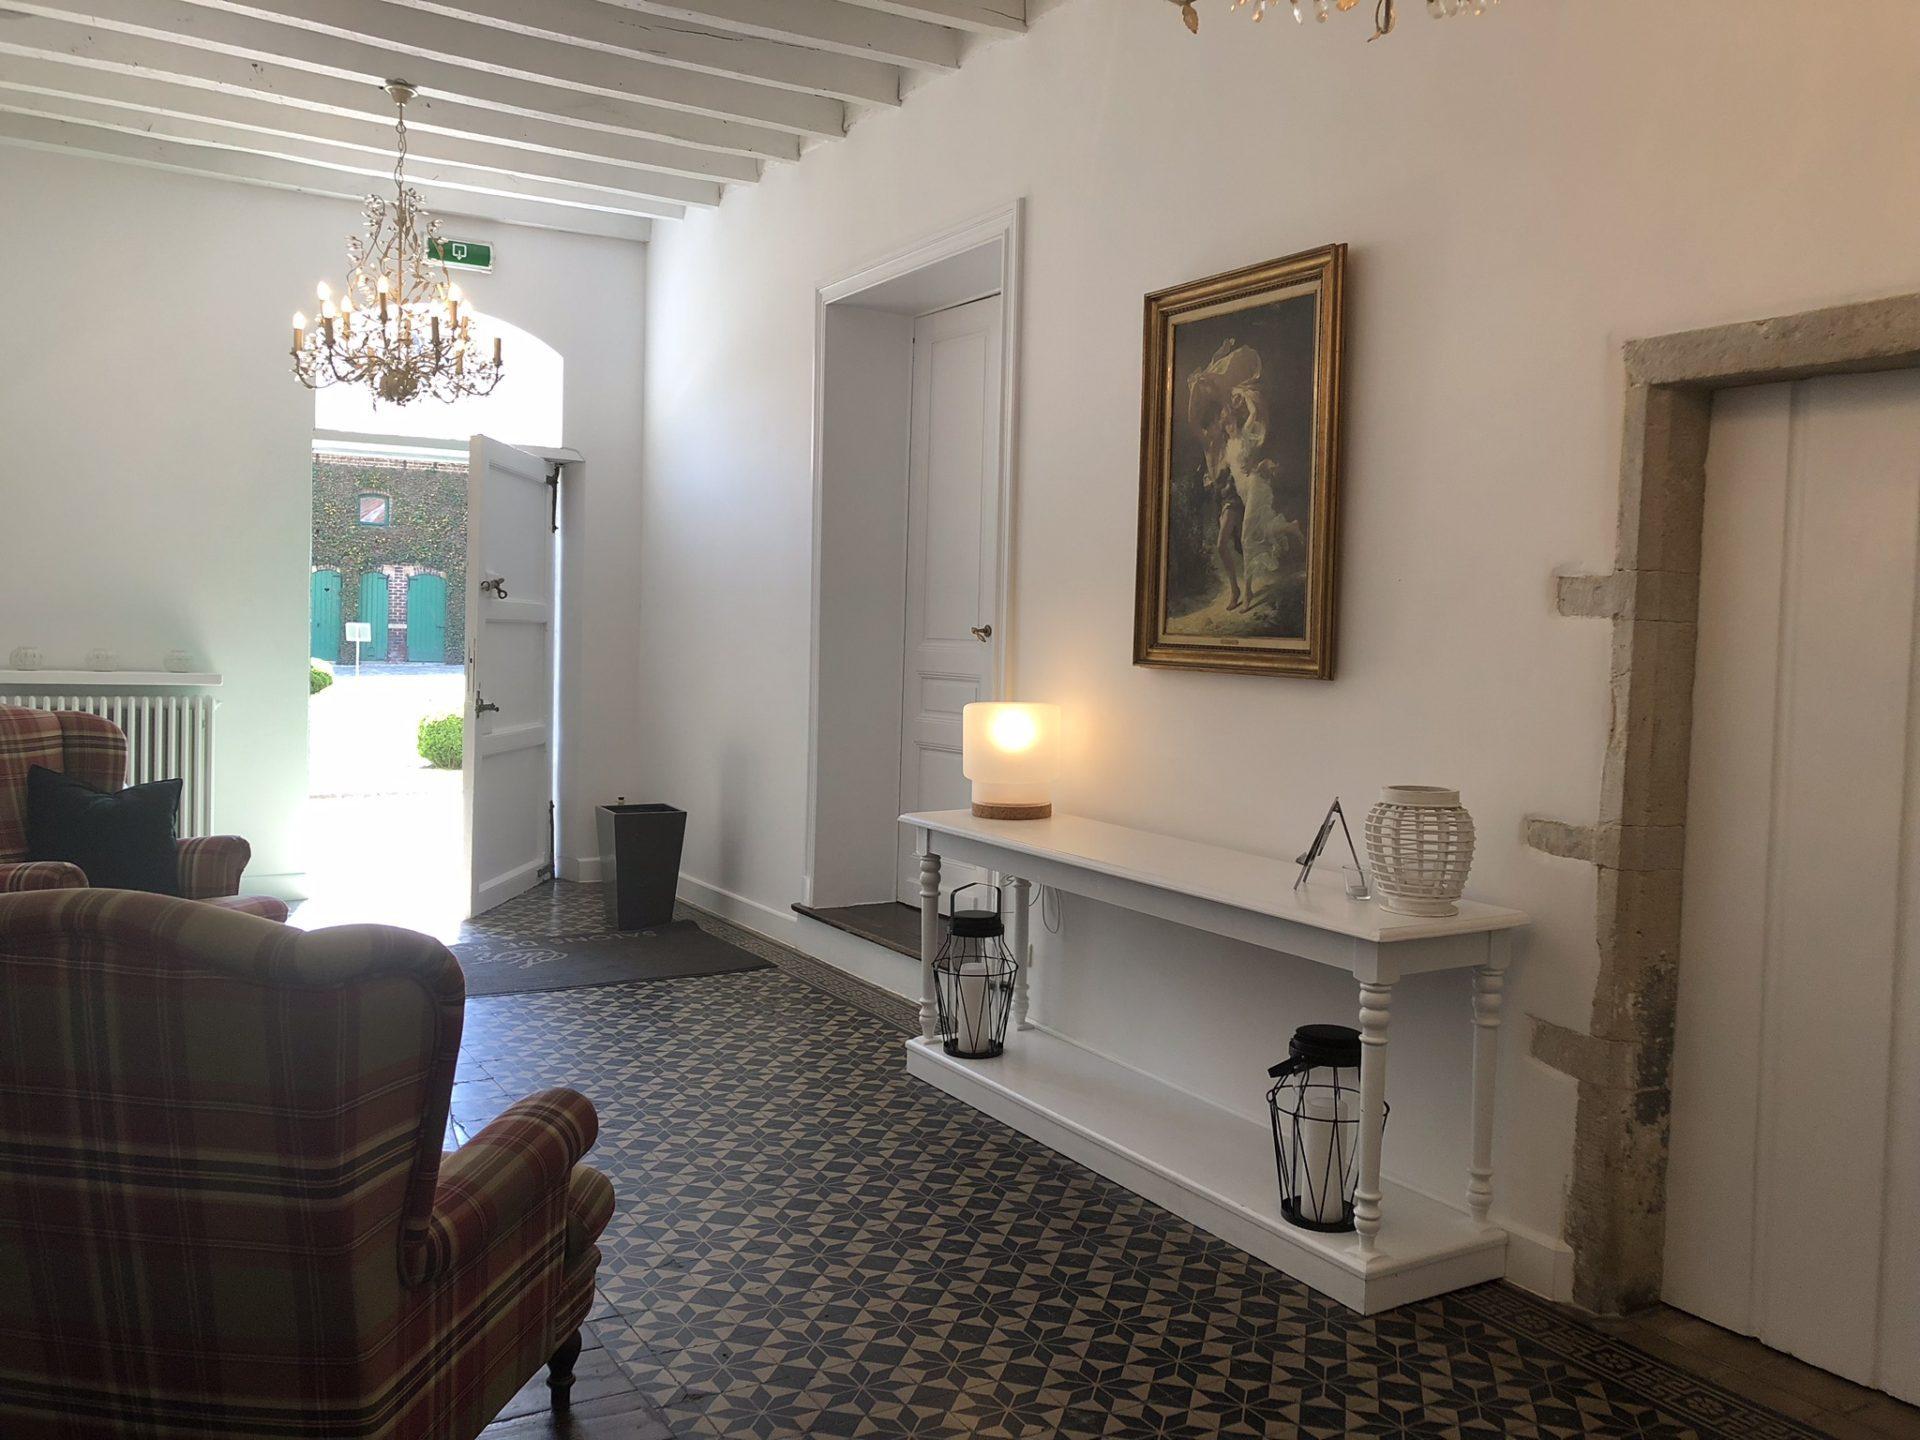 Boudoir - Salons de Romree